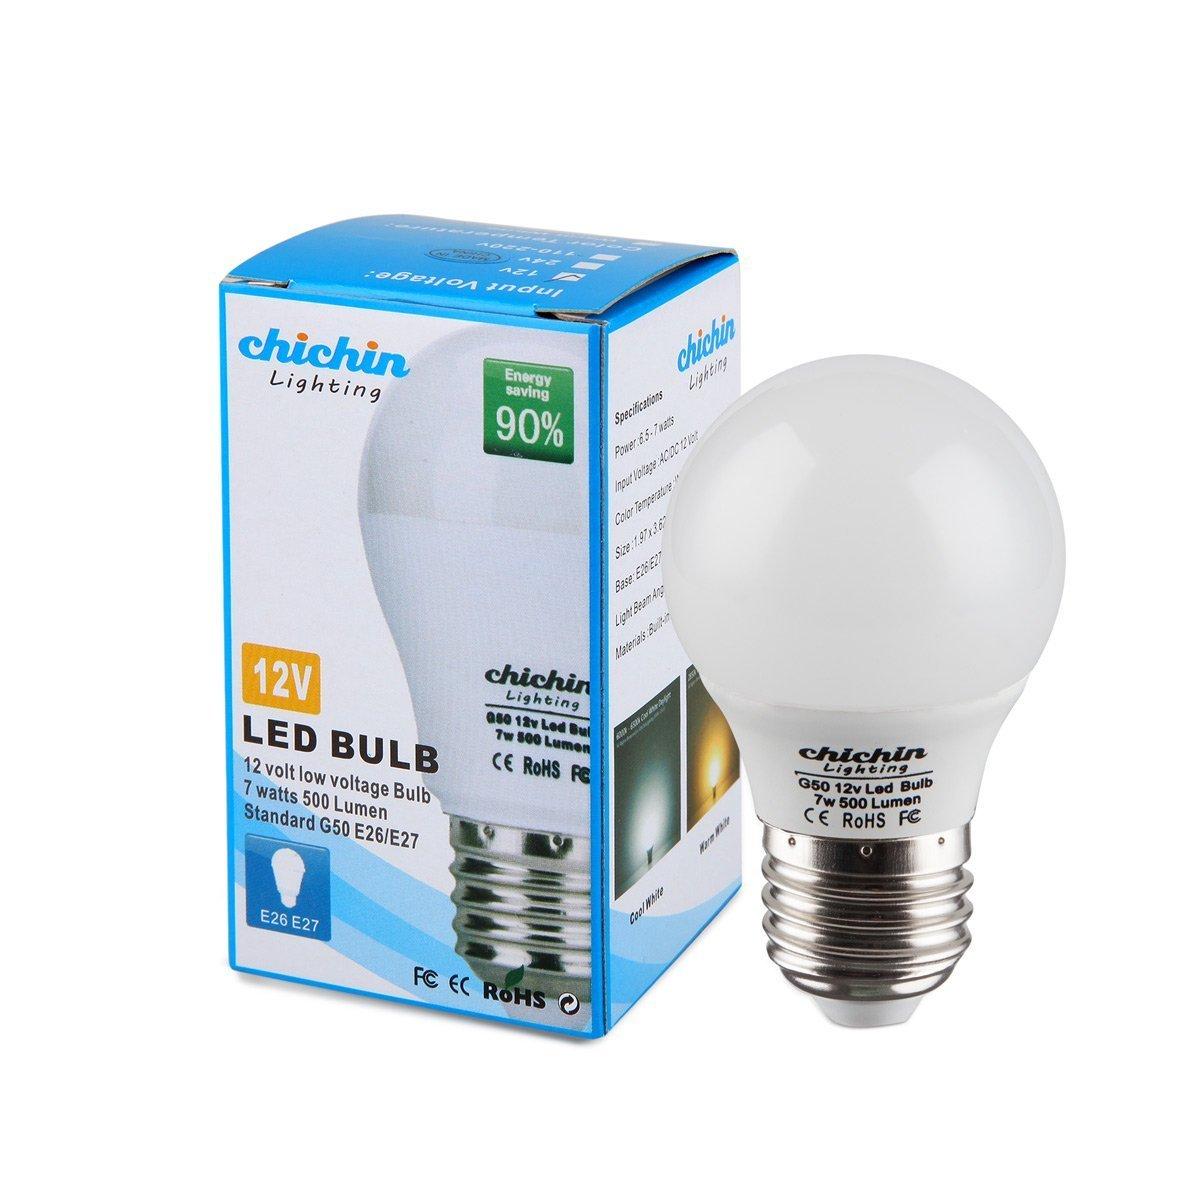 ChiChinLighting 12 Volt 7 Watt LED Light Bulb (3 Bulbs Per